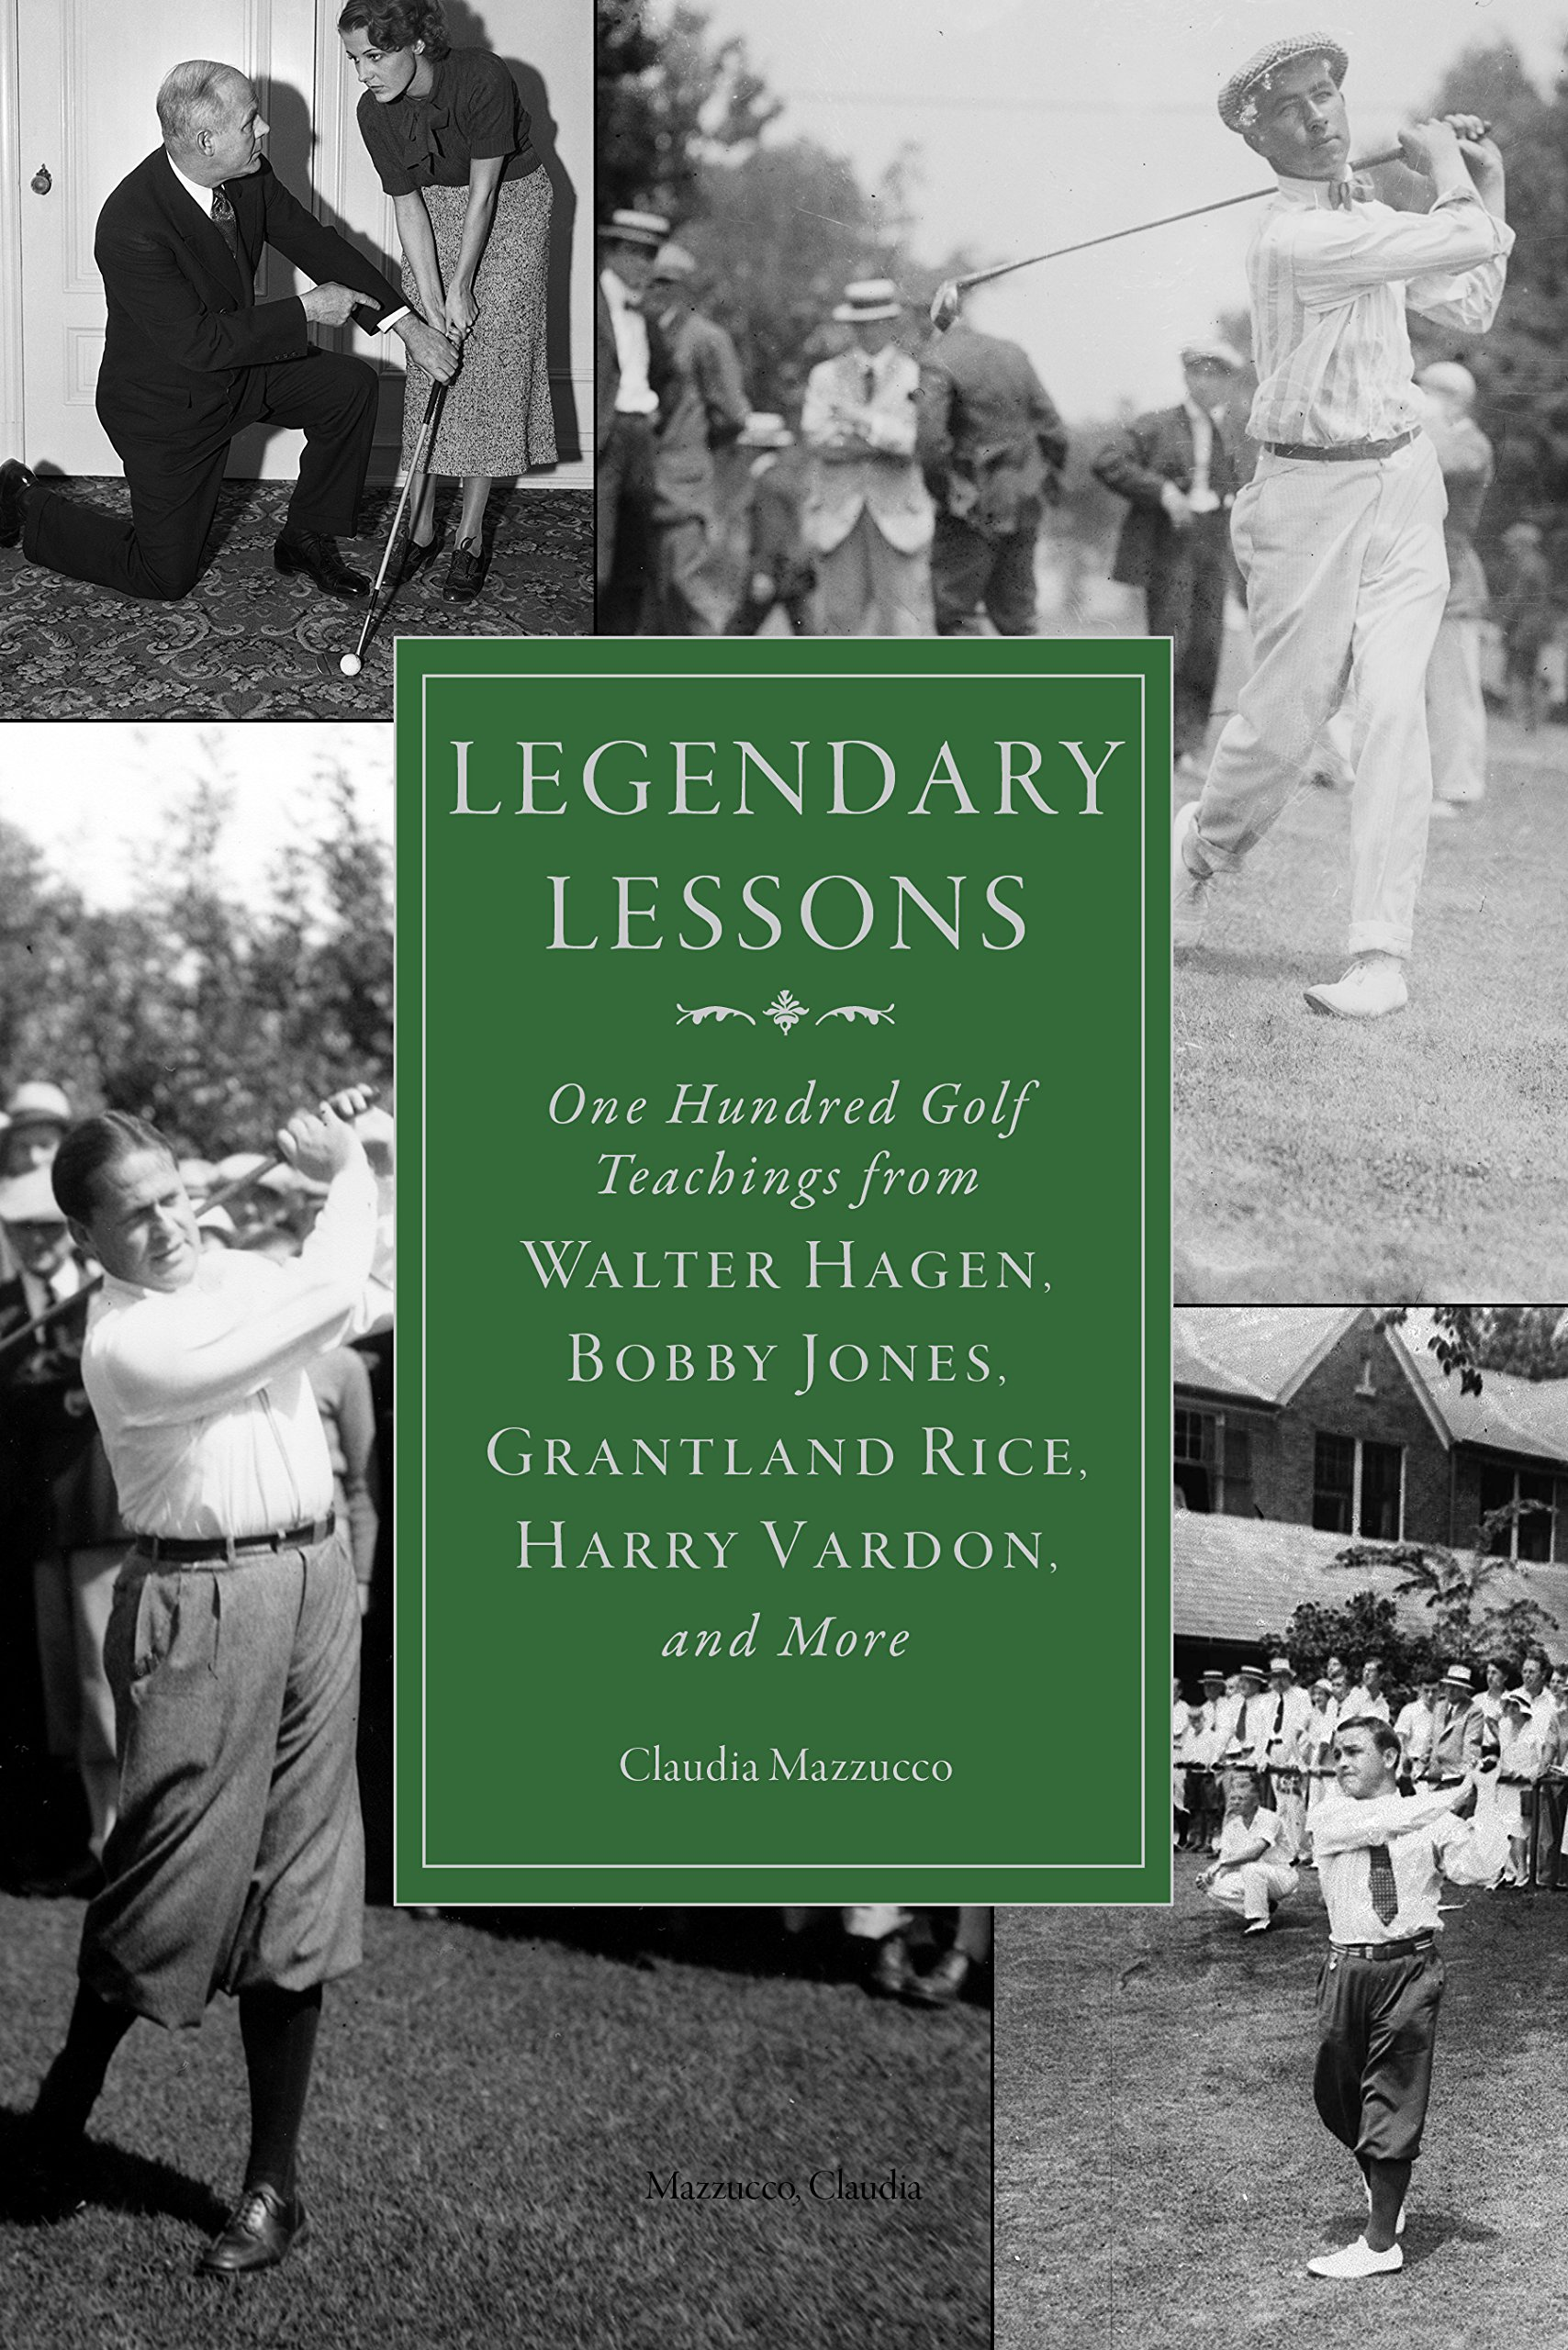 Legendary Lessons: More Than One Hundred Golf Teachings from Walter Hagen, Bobby Jones, Grantland Rice, Harry Vardon, and More ebook